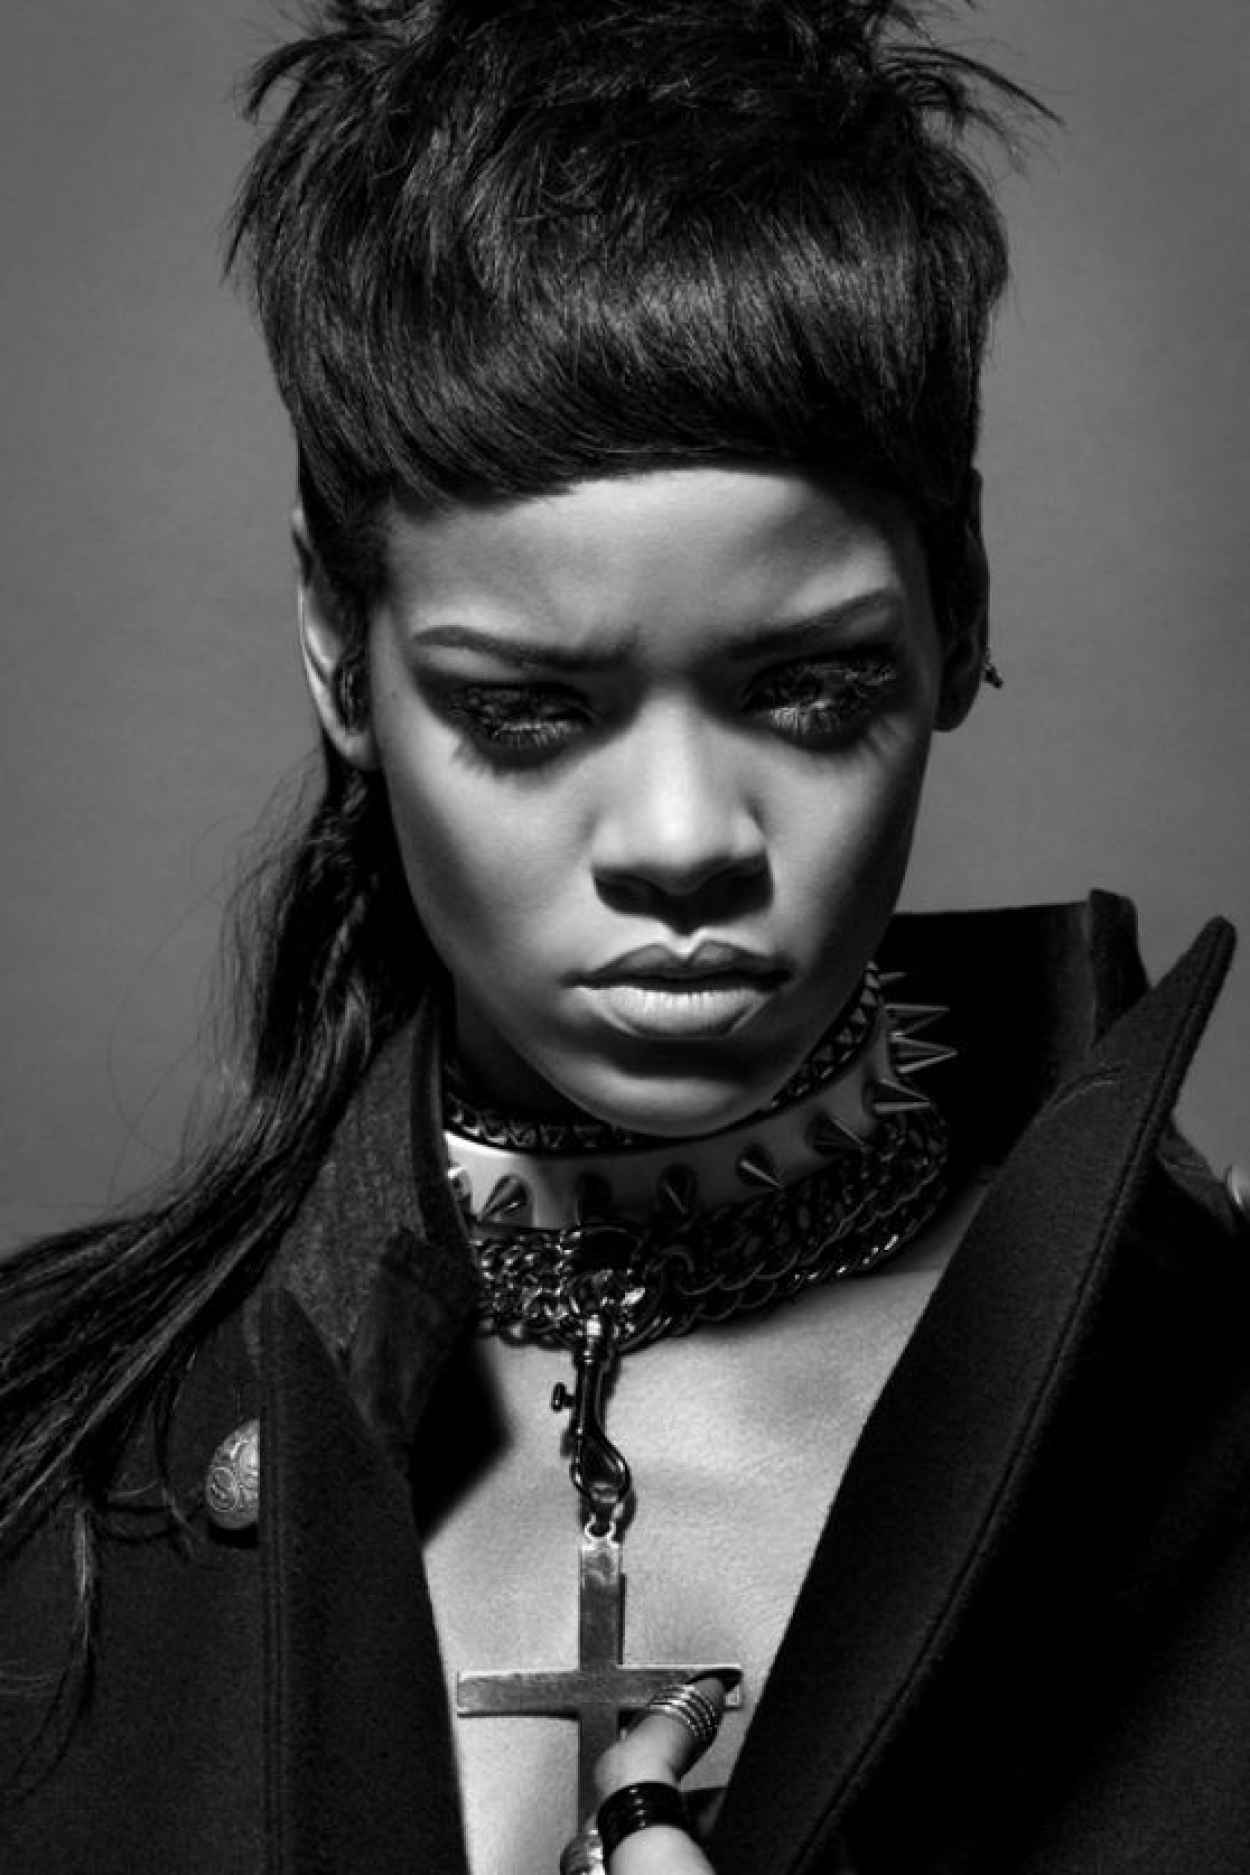 Rihanna Photoshoot for 032C Magazine Winter 2015/2014-1